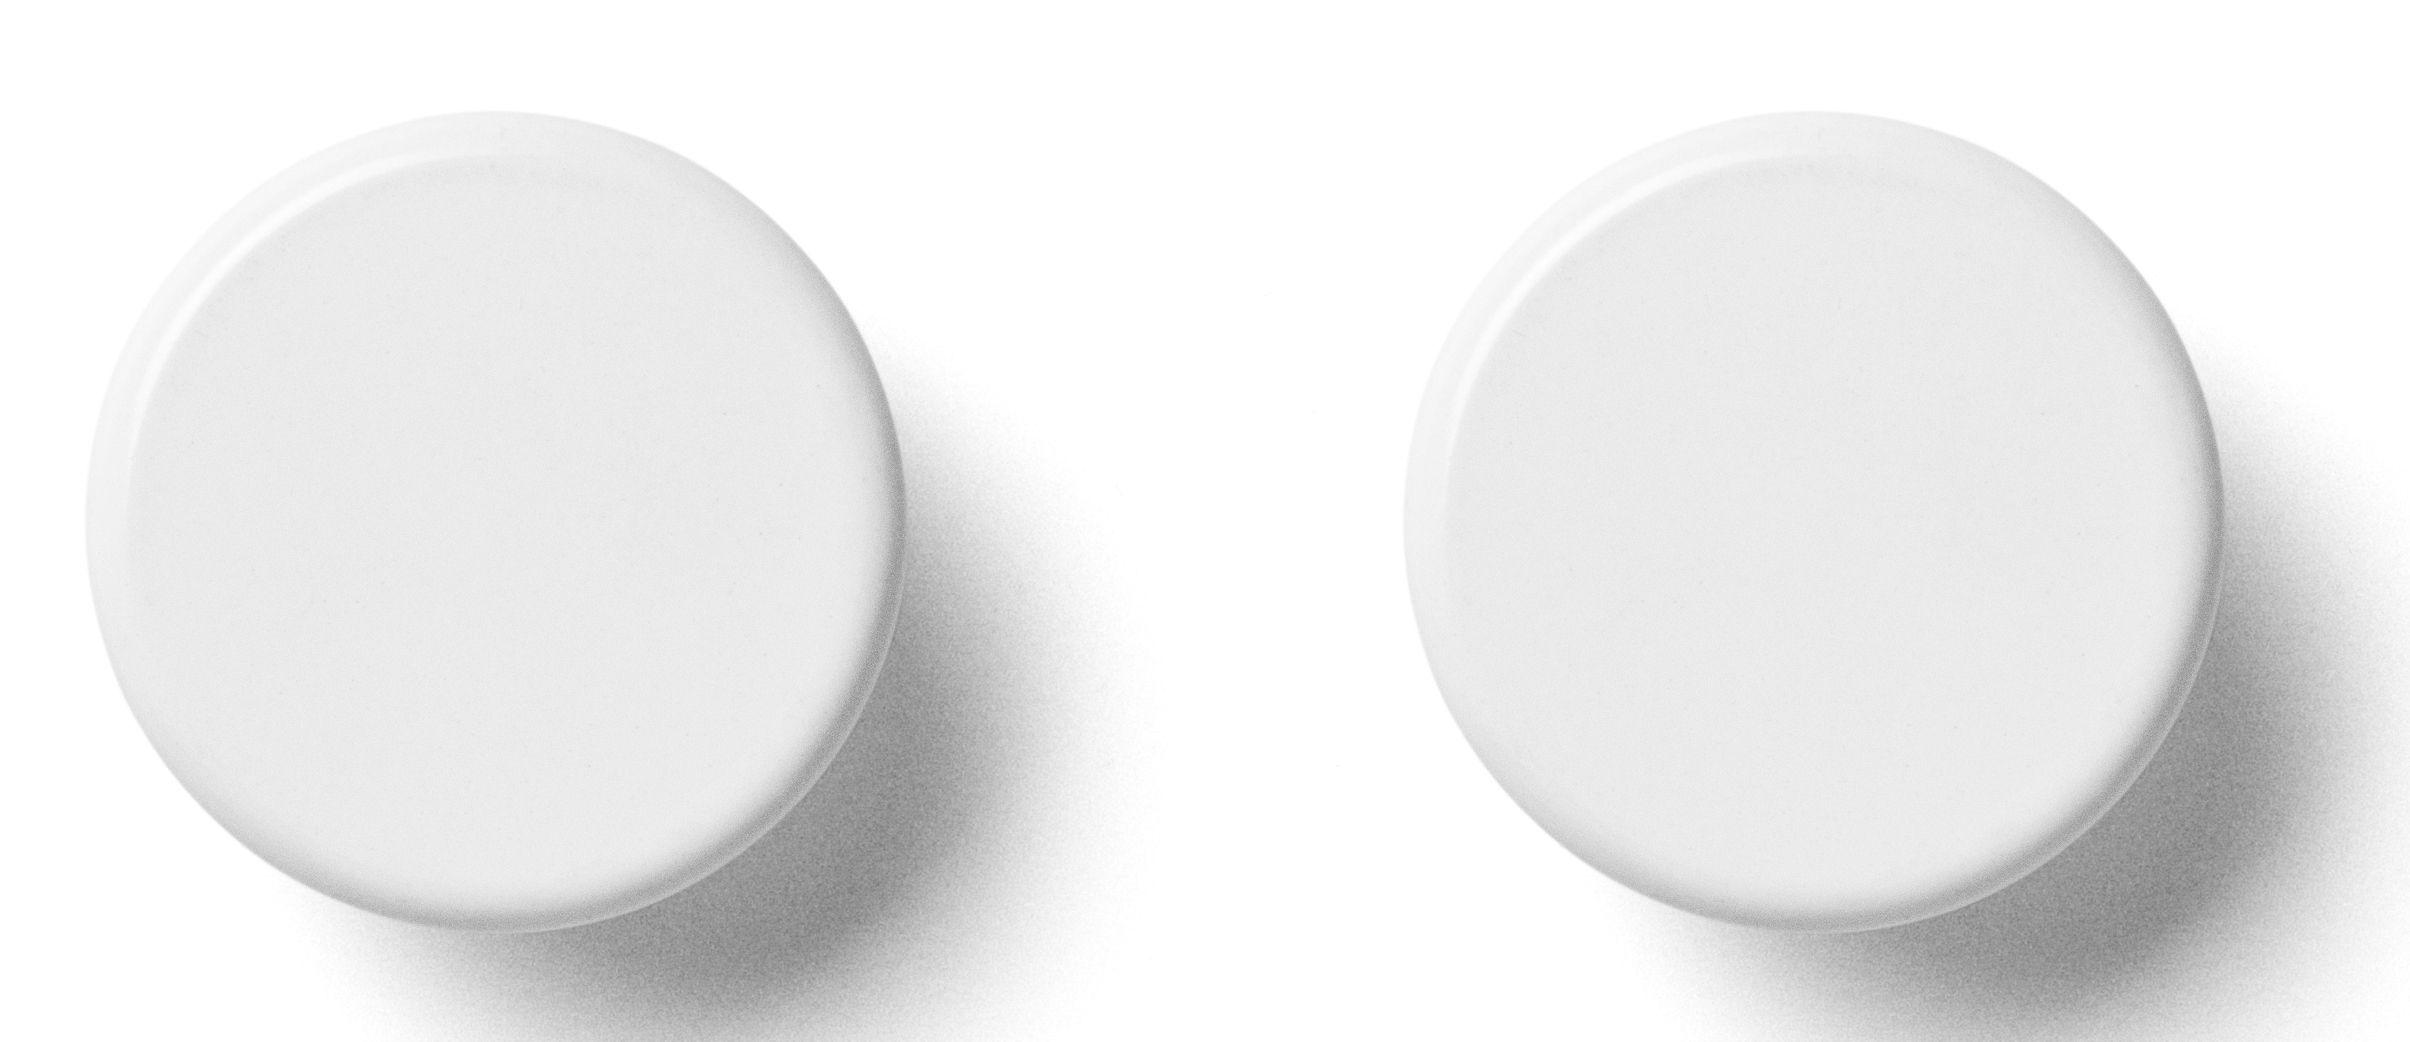 Arredamento - Appendiabiti  - Appendiabiti - / Set da 2 di Menu - Bianco - Acciaio